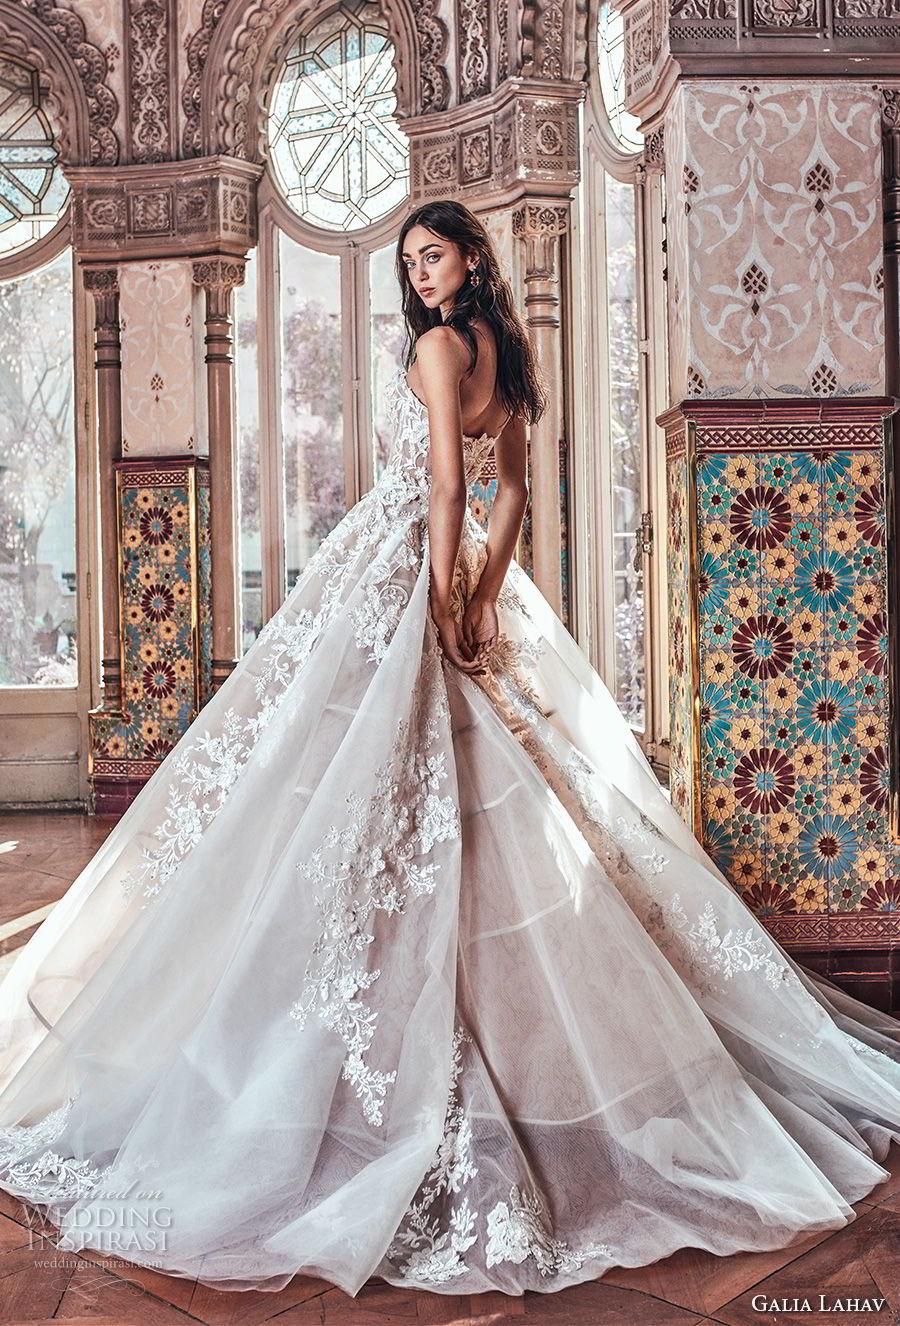 Galia Lahav Spring 2018 Wedding Dresses Victorian